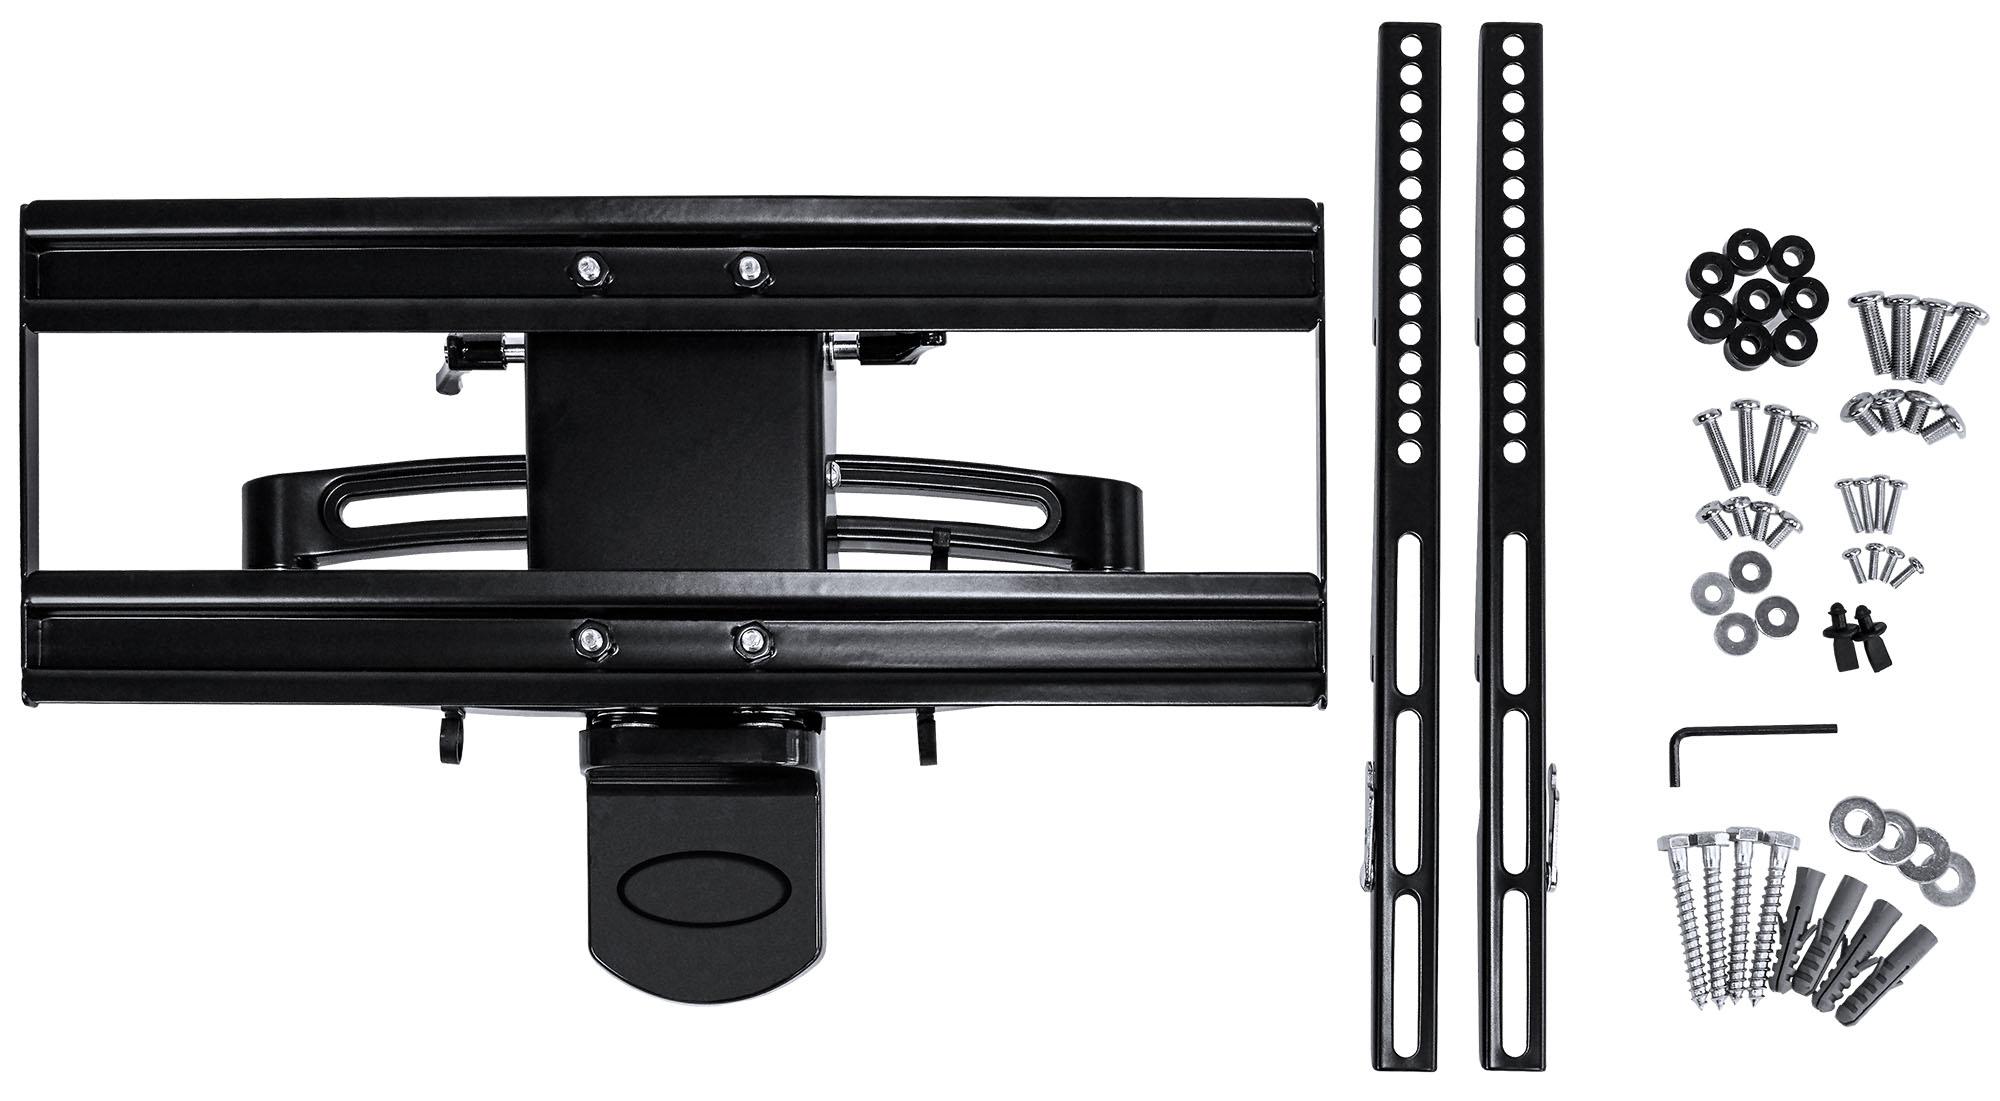 karcher wh 280 wandhalterung f r 66 117 cm 26 46 zoll lcd led plasma tv schwenk neigbar. Black Bedroom Furniture Sets. Home Design Ideas